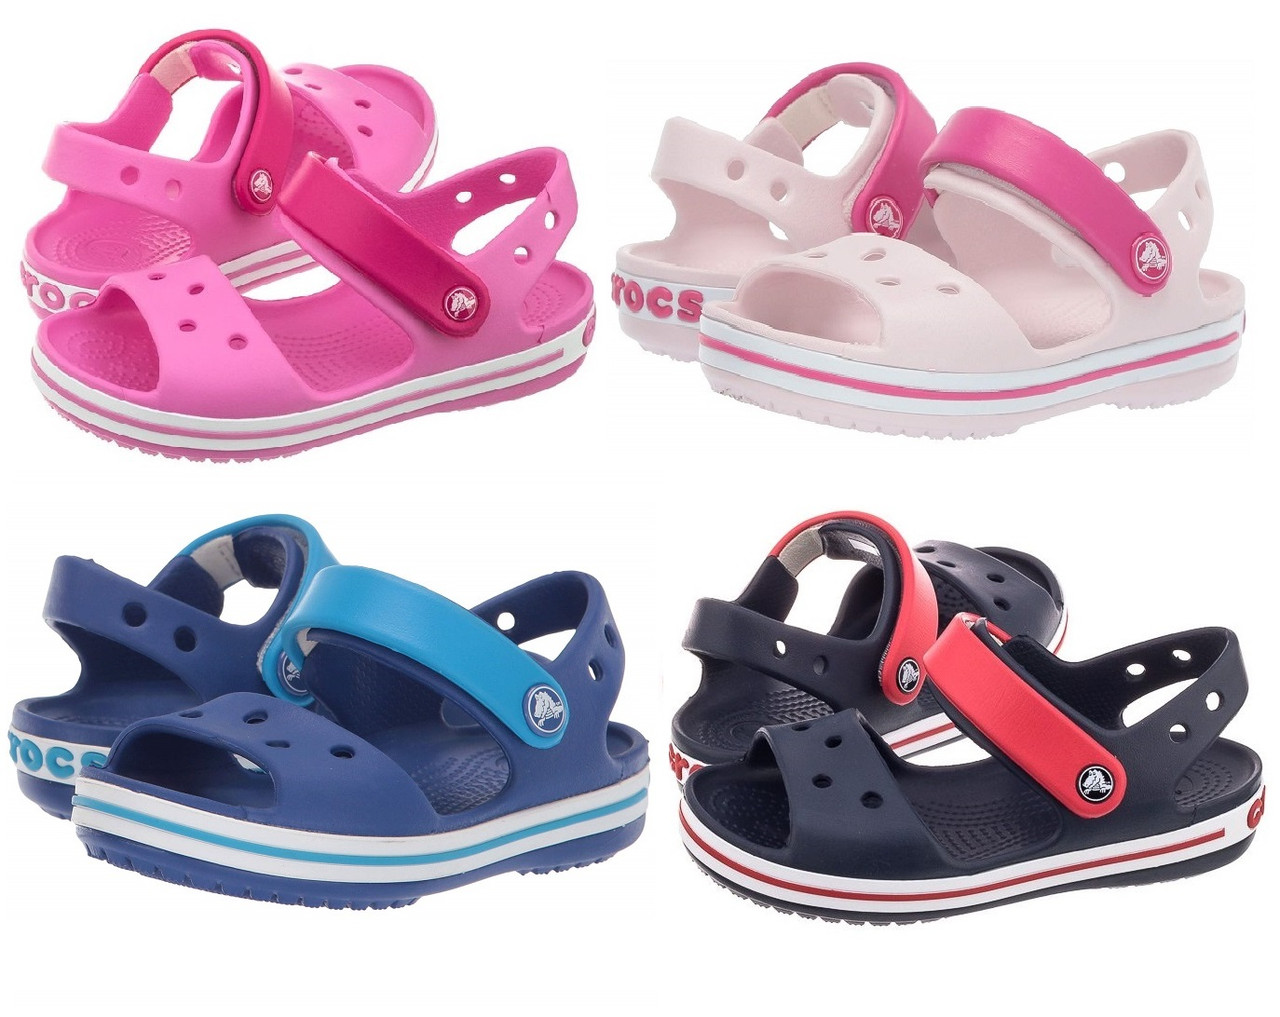 Босоножки Кроксы Крокбэнд сандалии / Crocs Kids Crocband Sandal